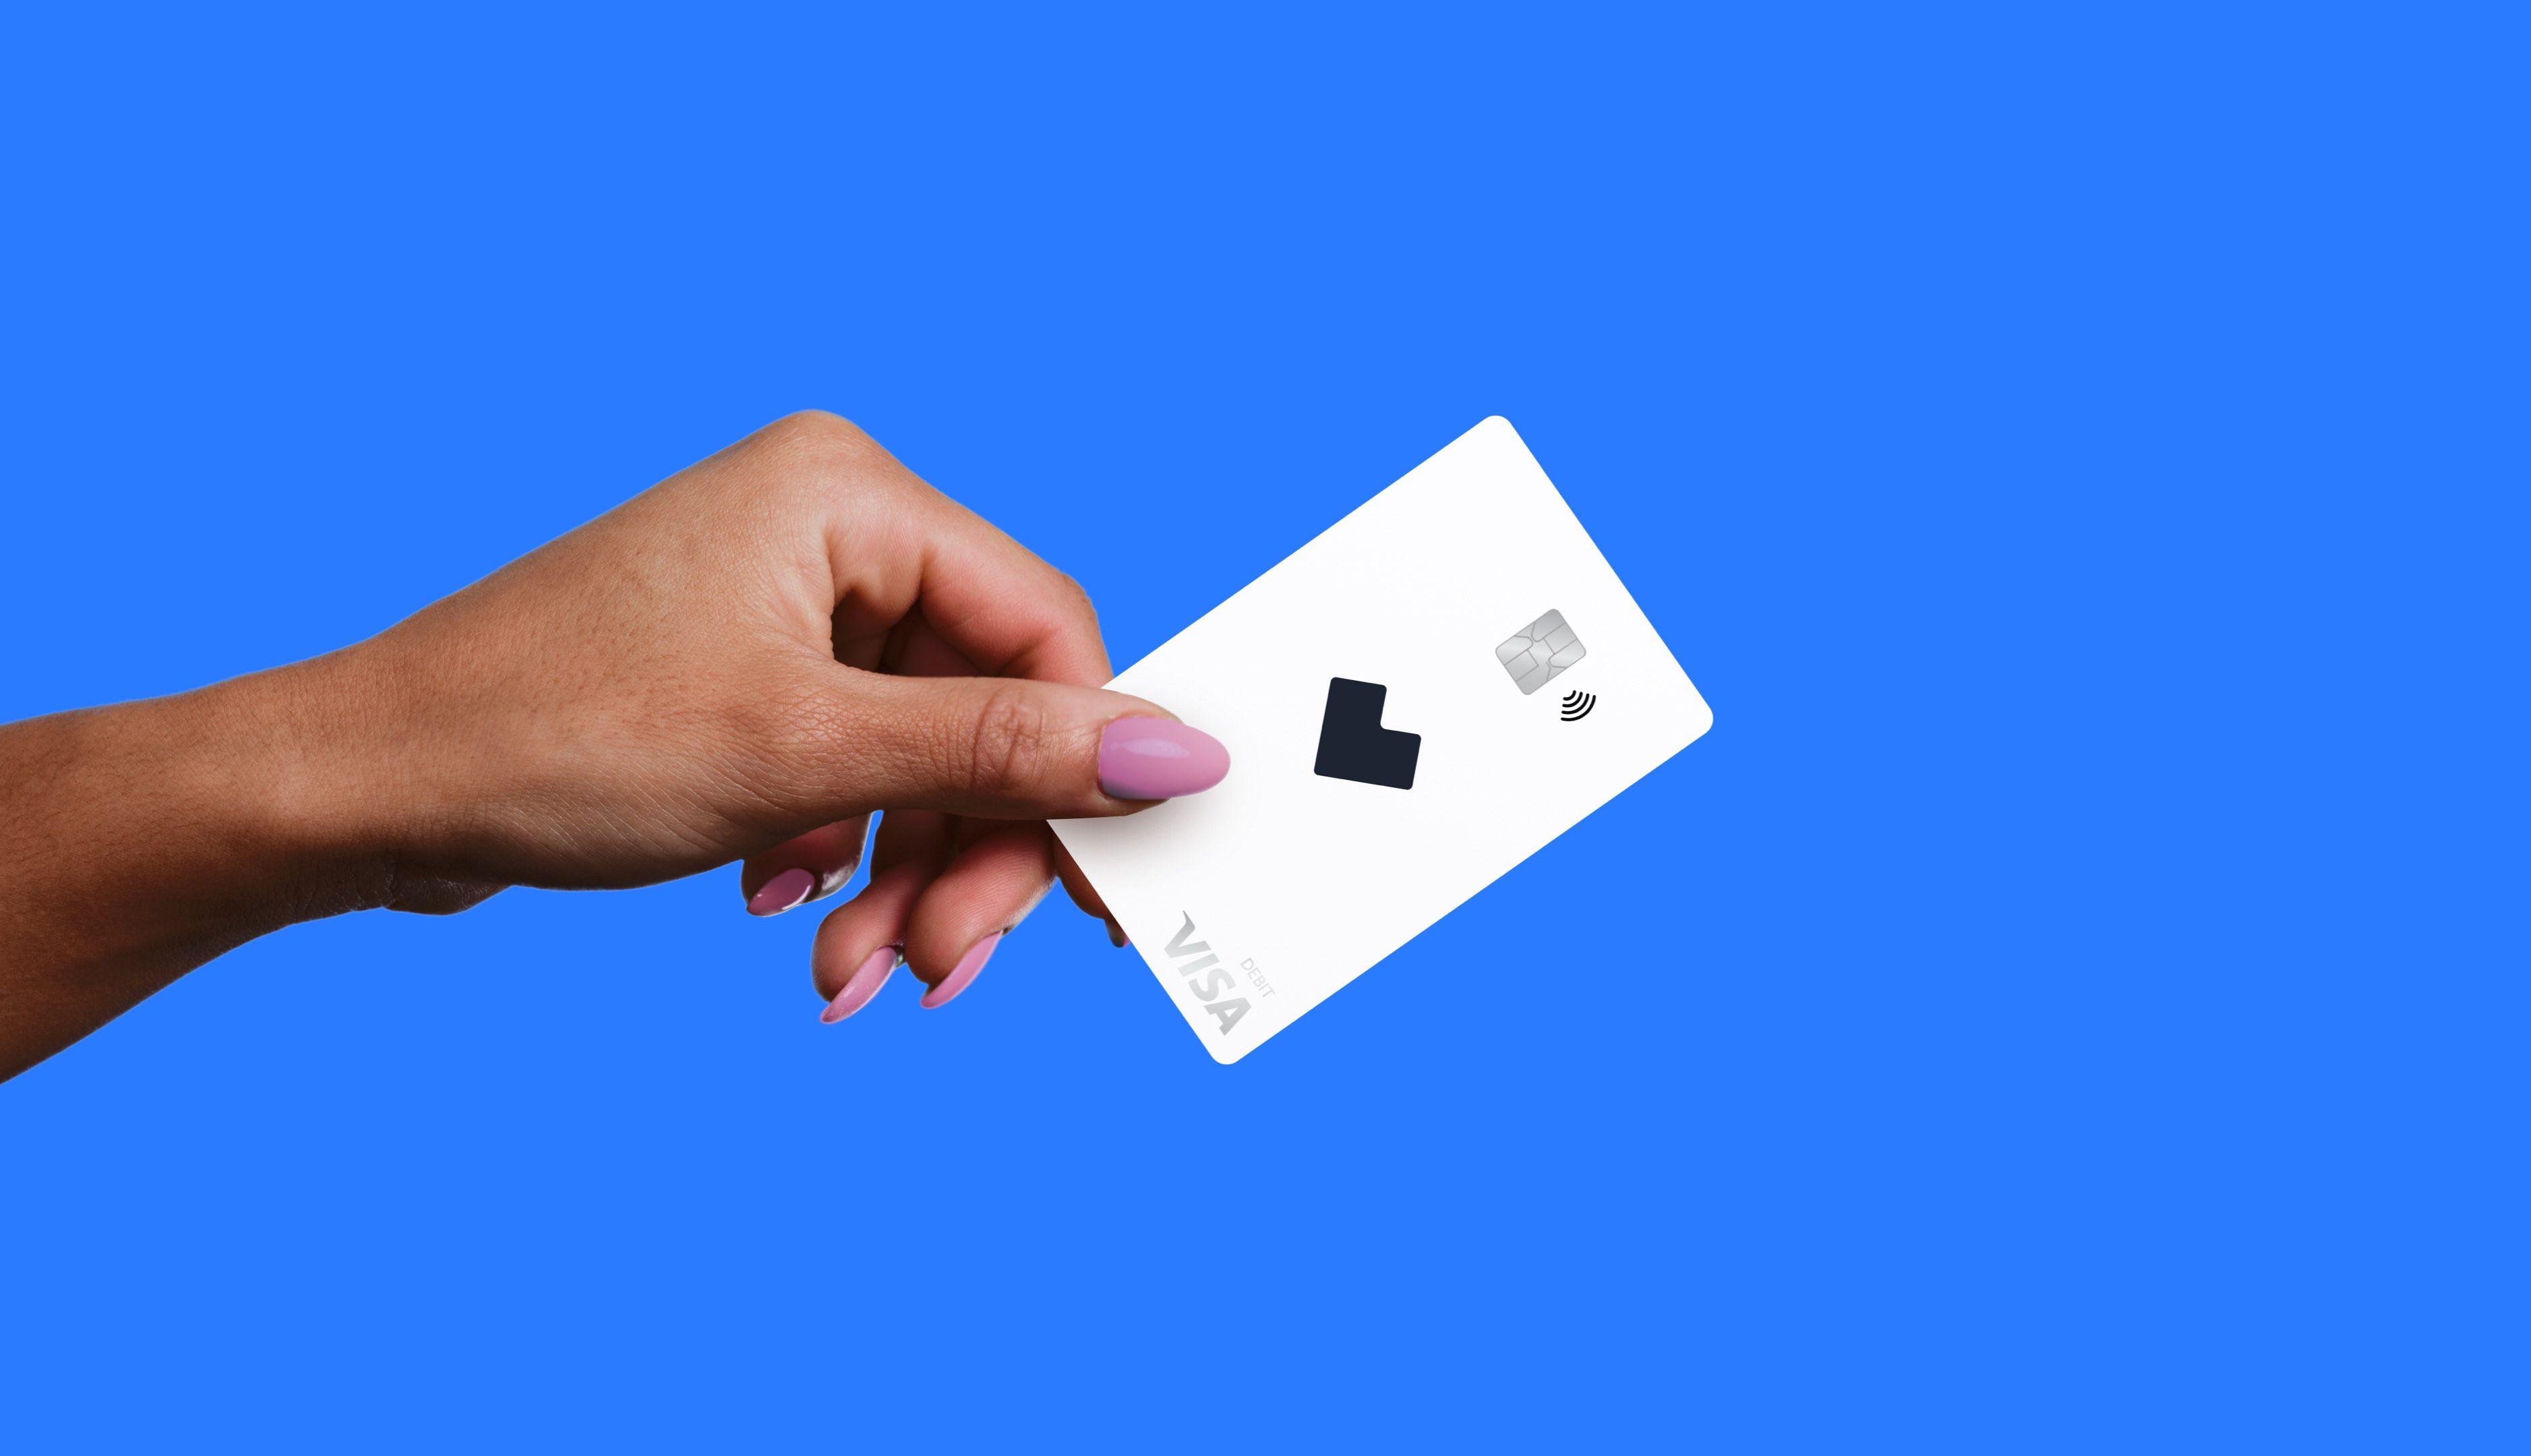 White Starship HSA card on blue background.